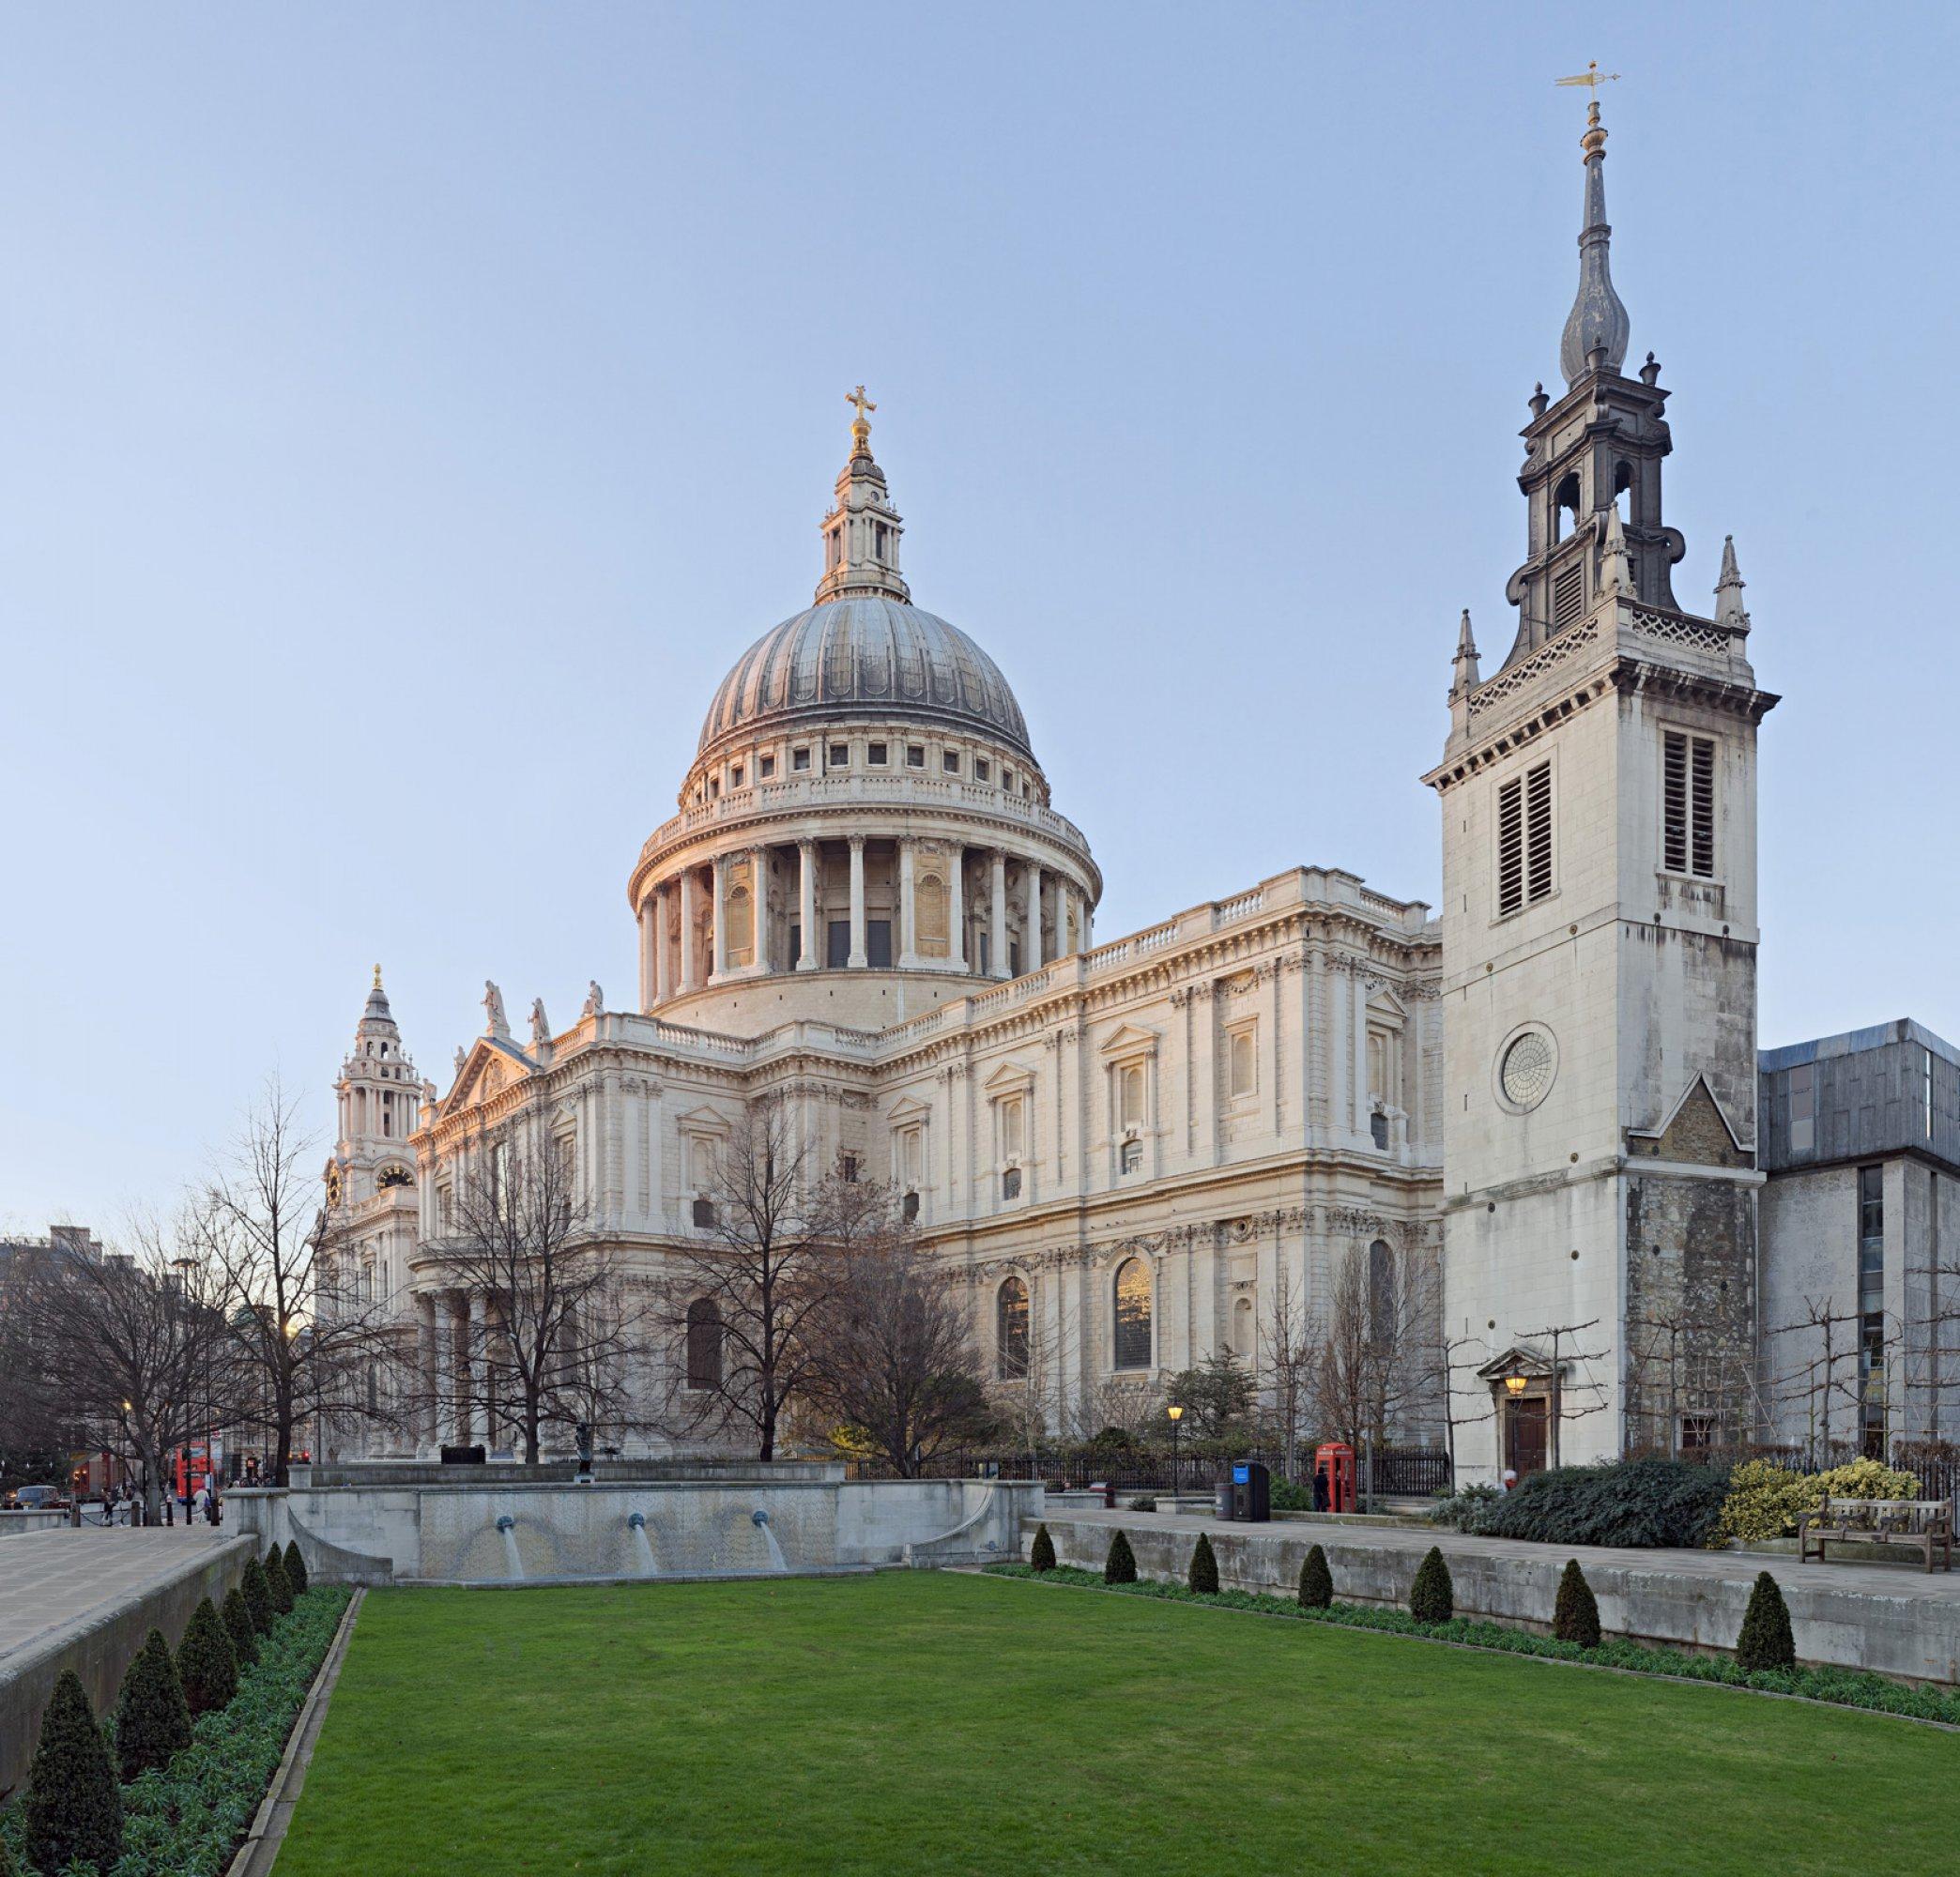 https://bubo.sk/uploads/galleries/5048/london-st-paul-s-cathedral-london-england-jan-2010.jpg